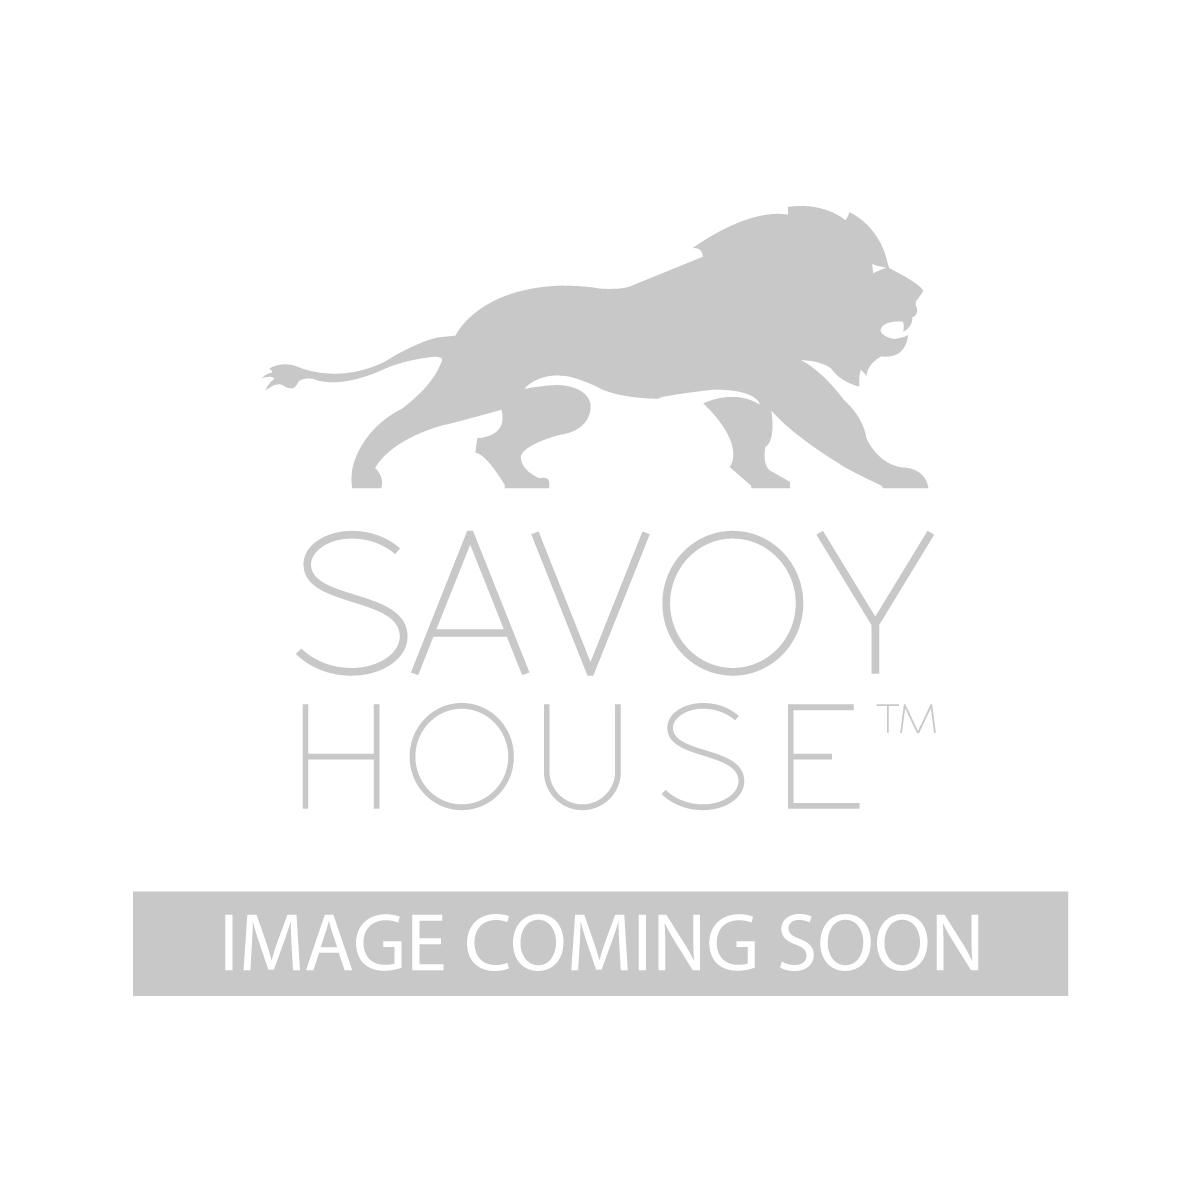 8 5302 4 32 keating 4 light bath bar by savoy house keating 4 light bath bar aloadofball Gallery